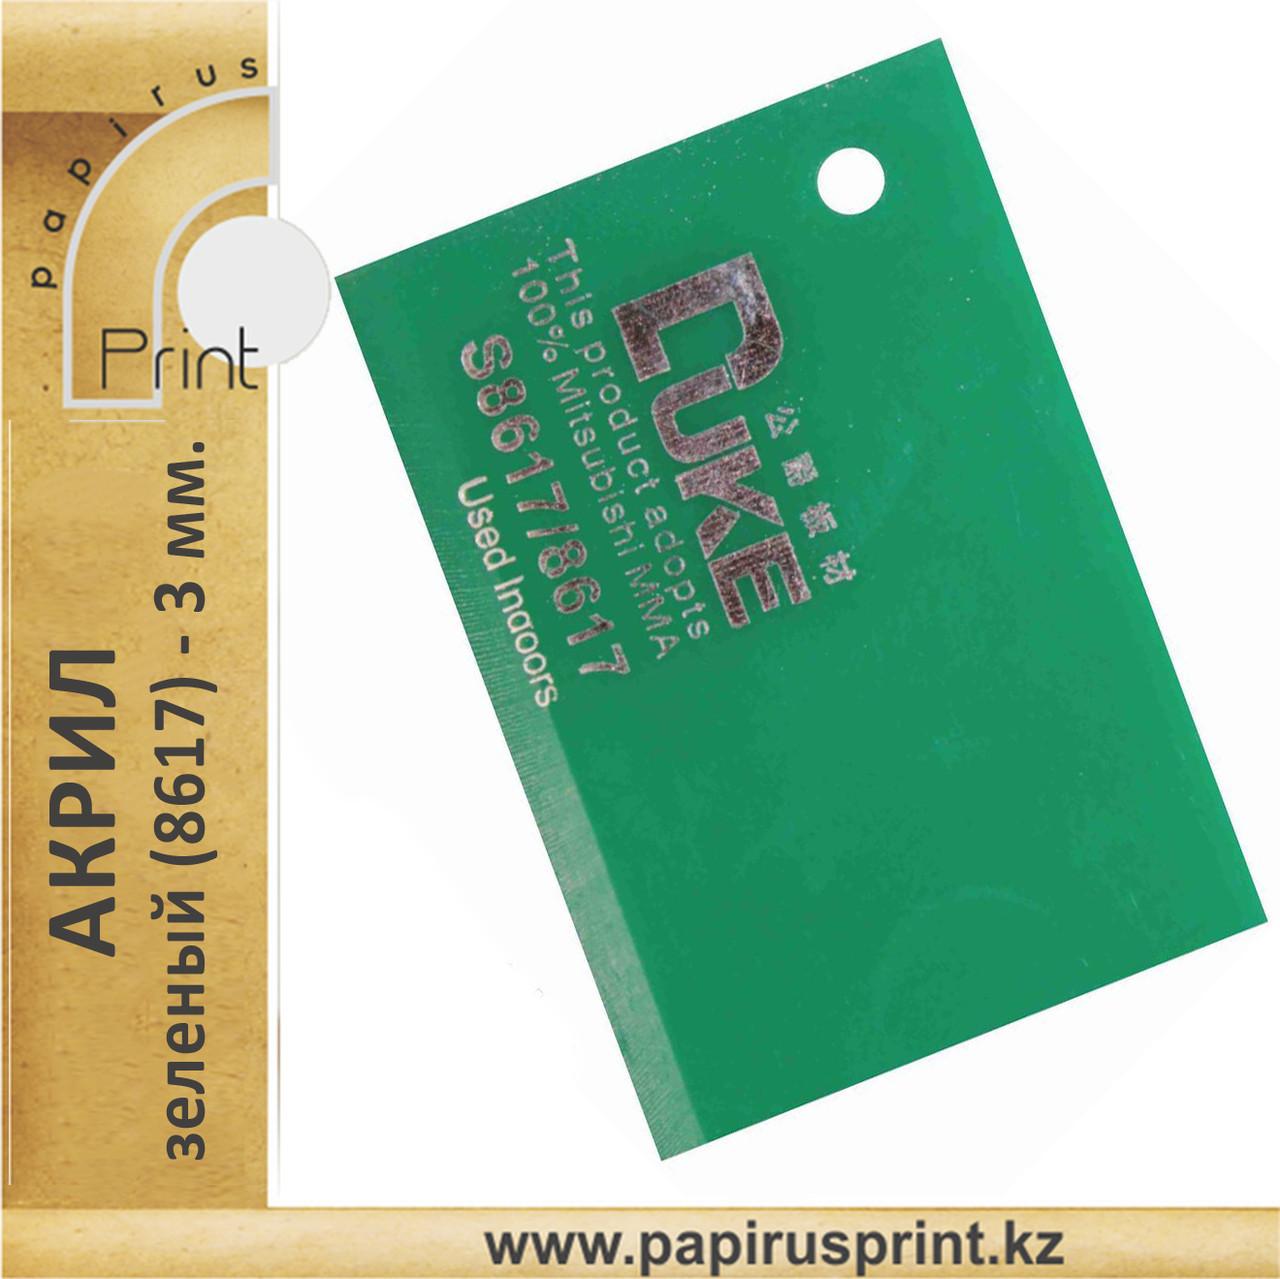 Зеленый акрил 3 мм №8617 1.26 х 2.48 мм